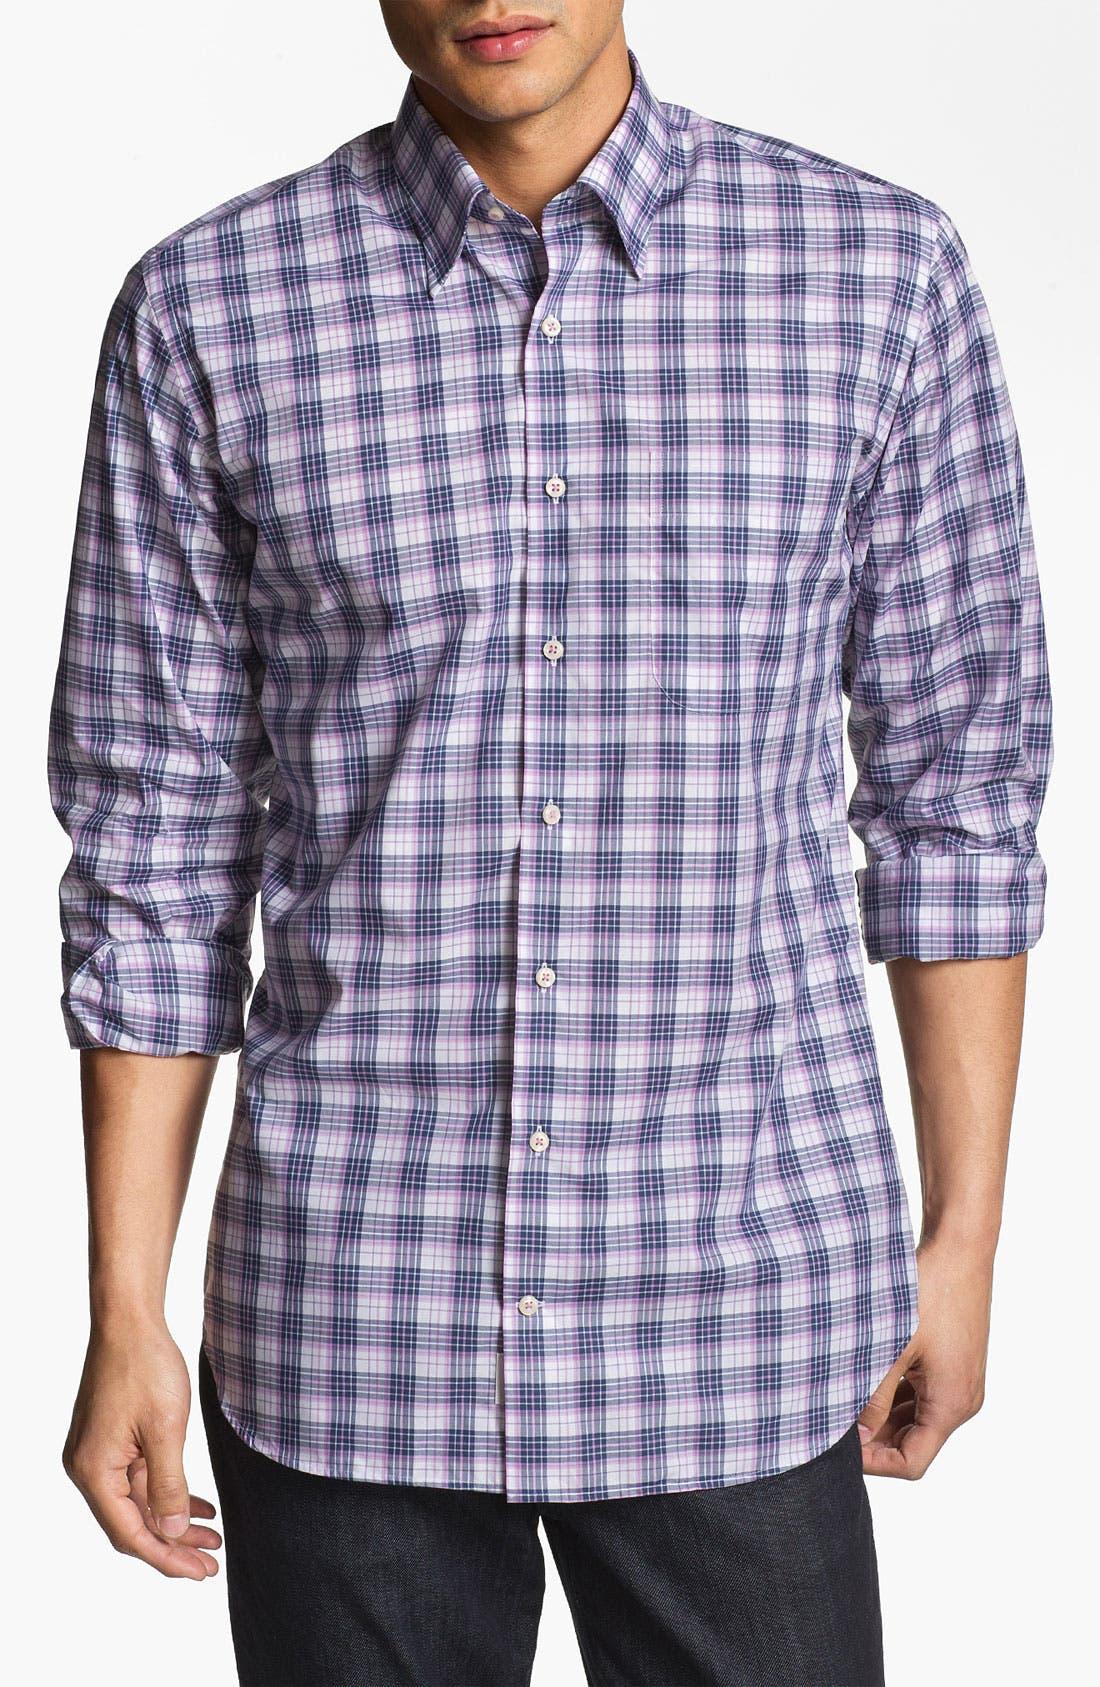 Alternate Image 1 Selected - Peter Millar 'Portofino' Regular Fit Sport Shirt